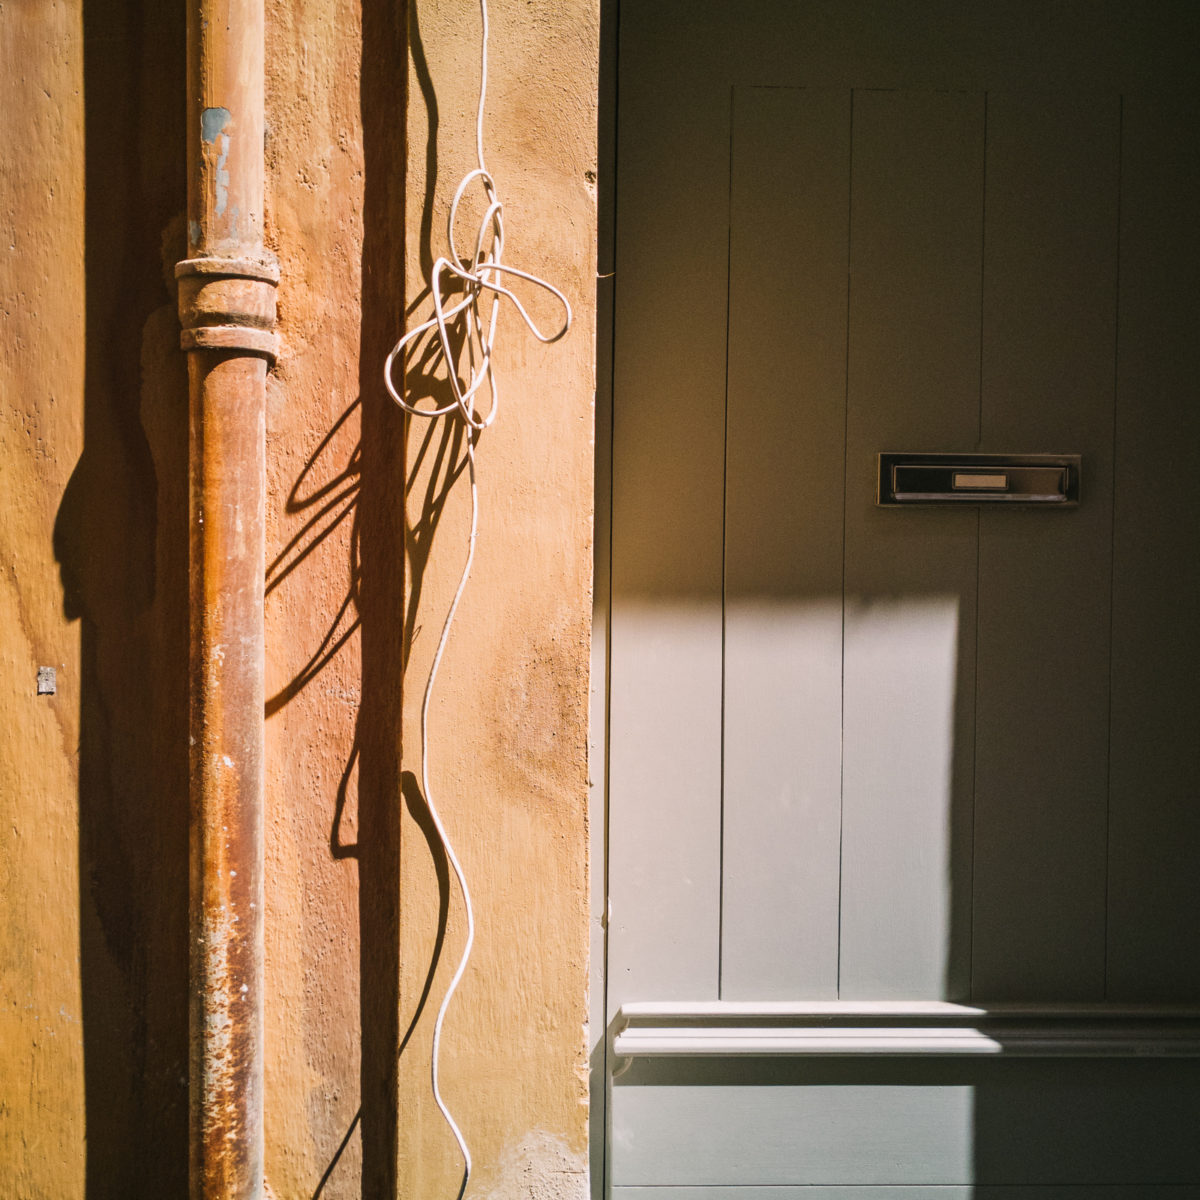 aliocha boi arles photographie projections ombre lumiere1 - Le photographe Aliocha Boi révèle la façade street d'Arles